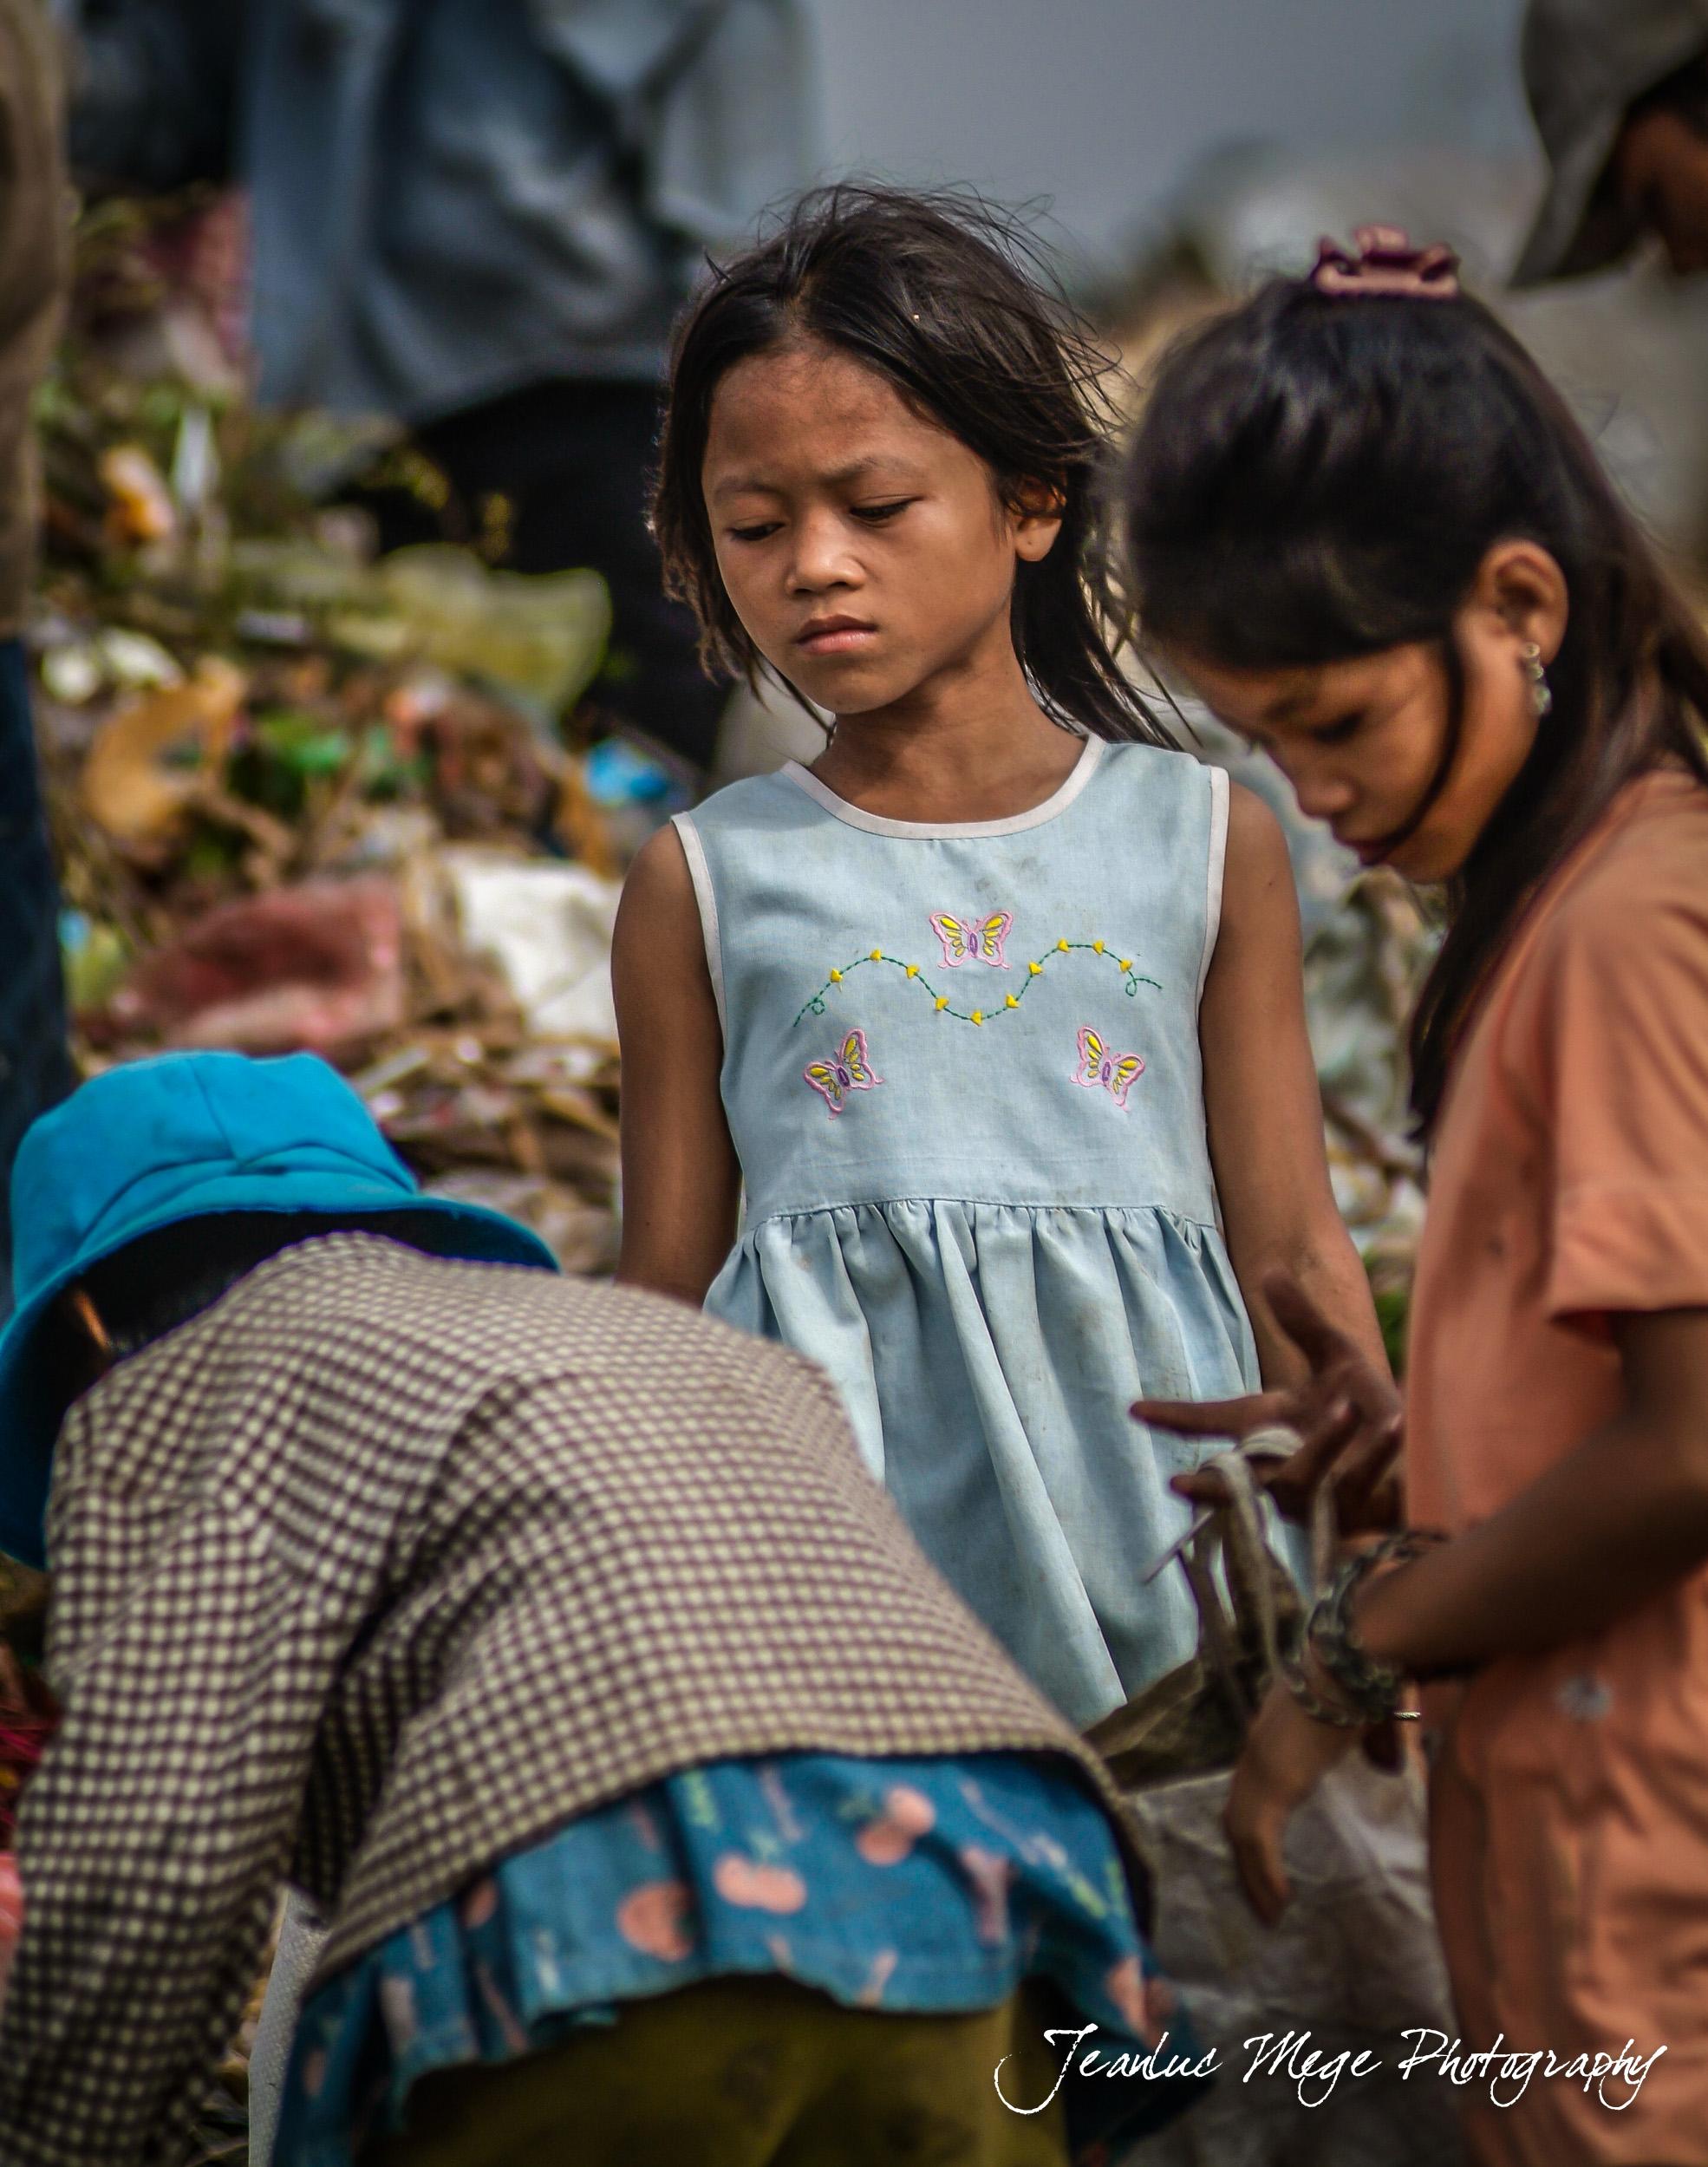 Jean Luc Mege Cambodia-8812.jpg